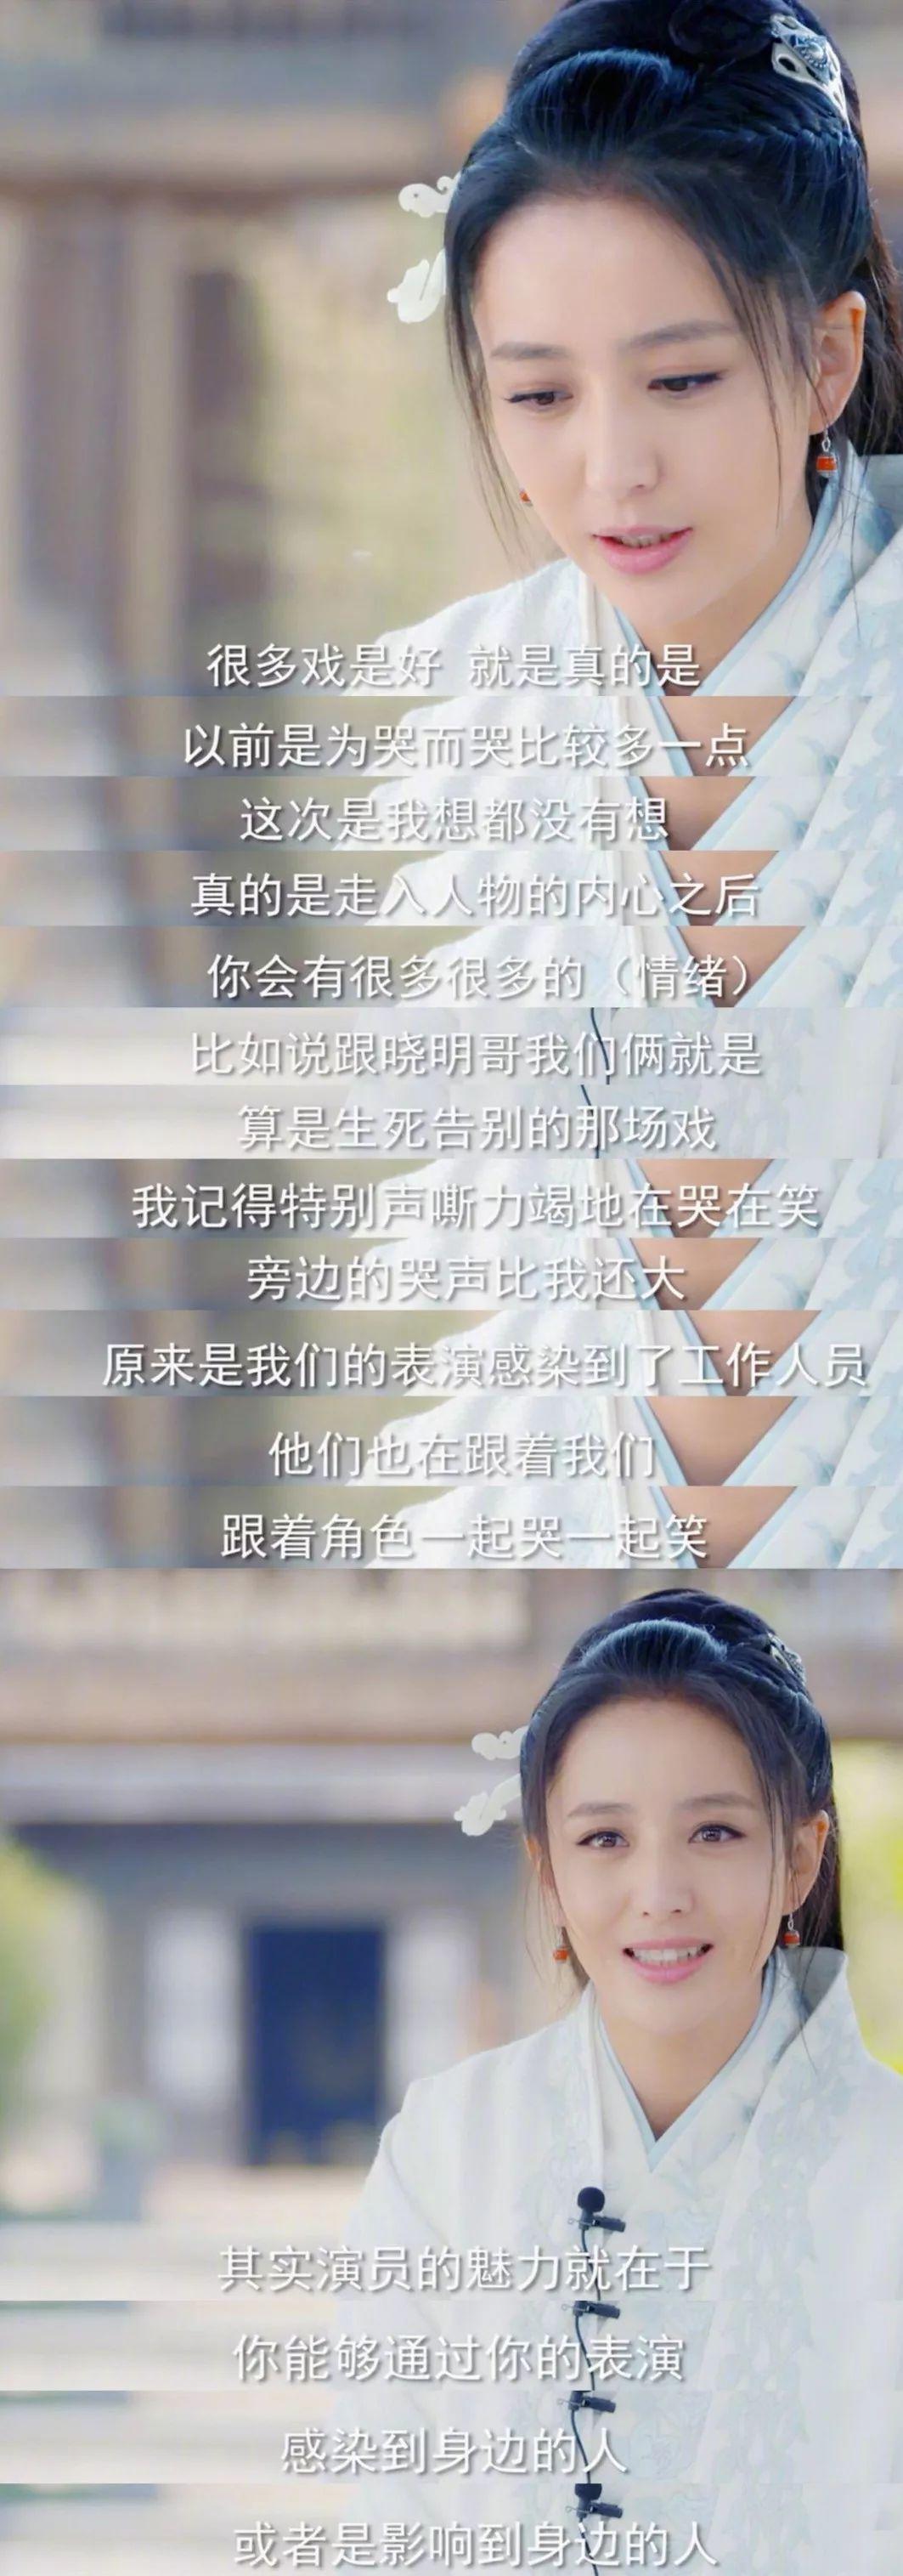 BazaarVStar | 佟丽娅:温柔不是杀手锏,而是内心强大的最好表达。